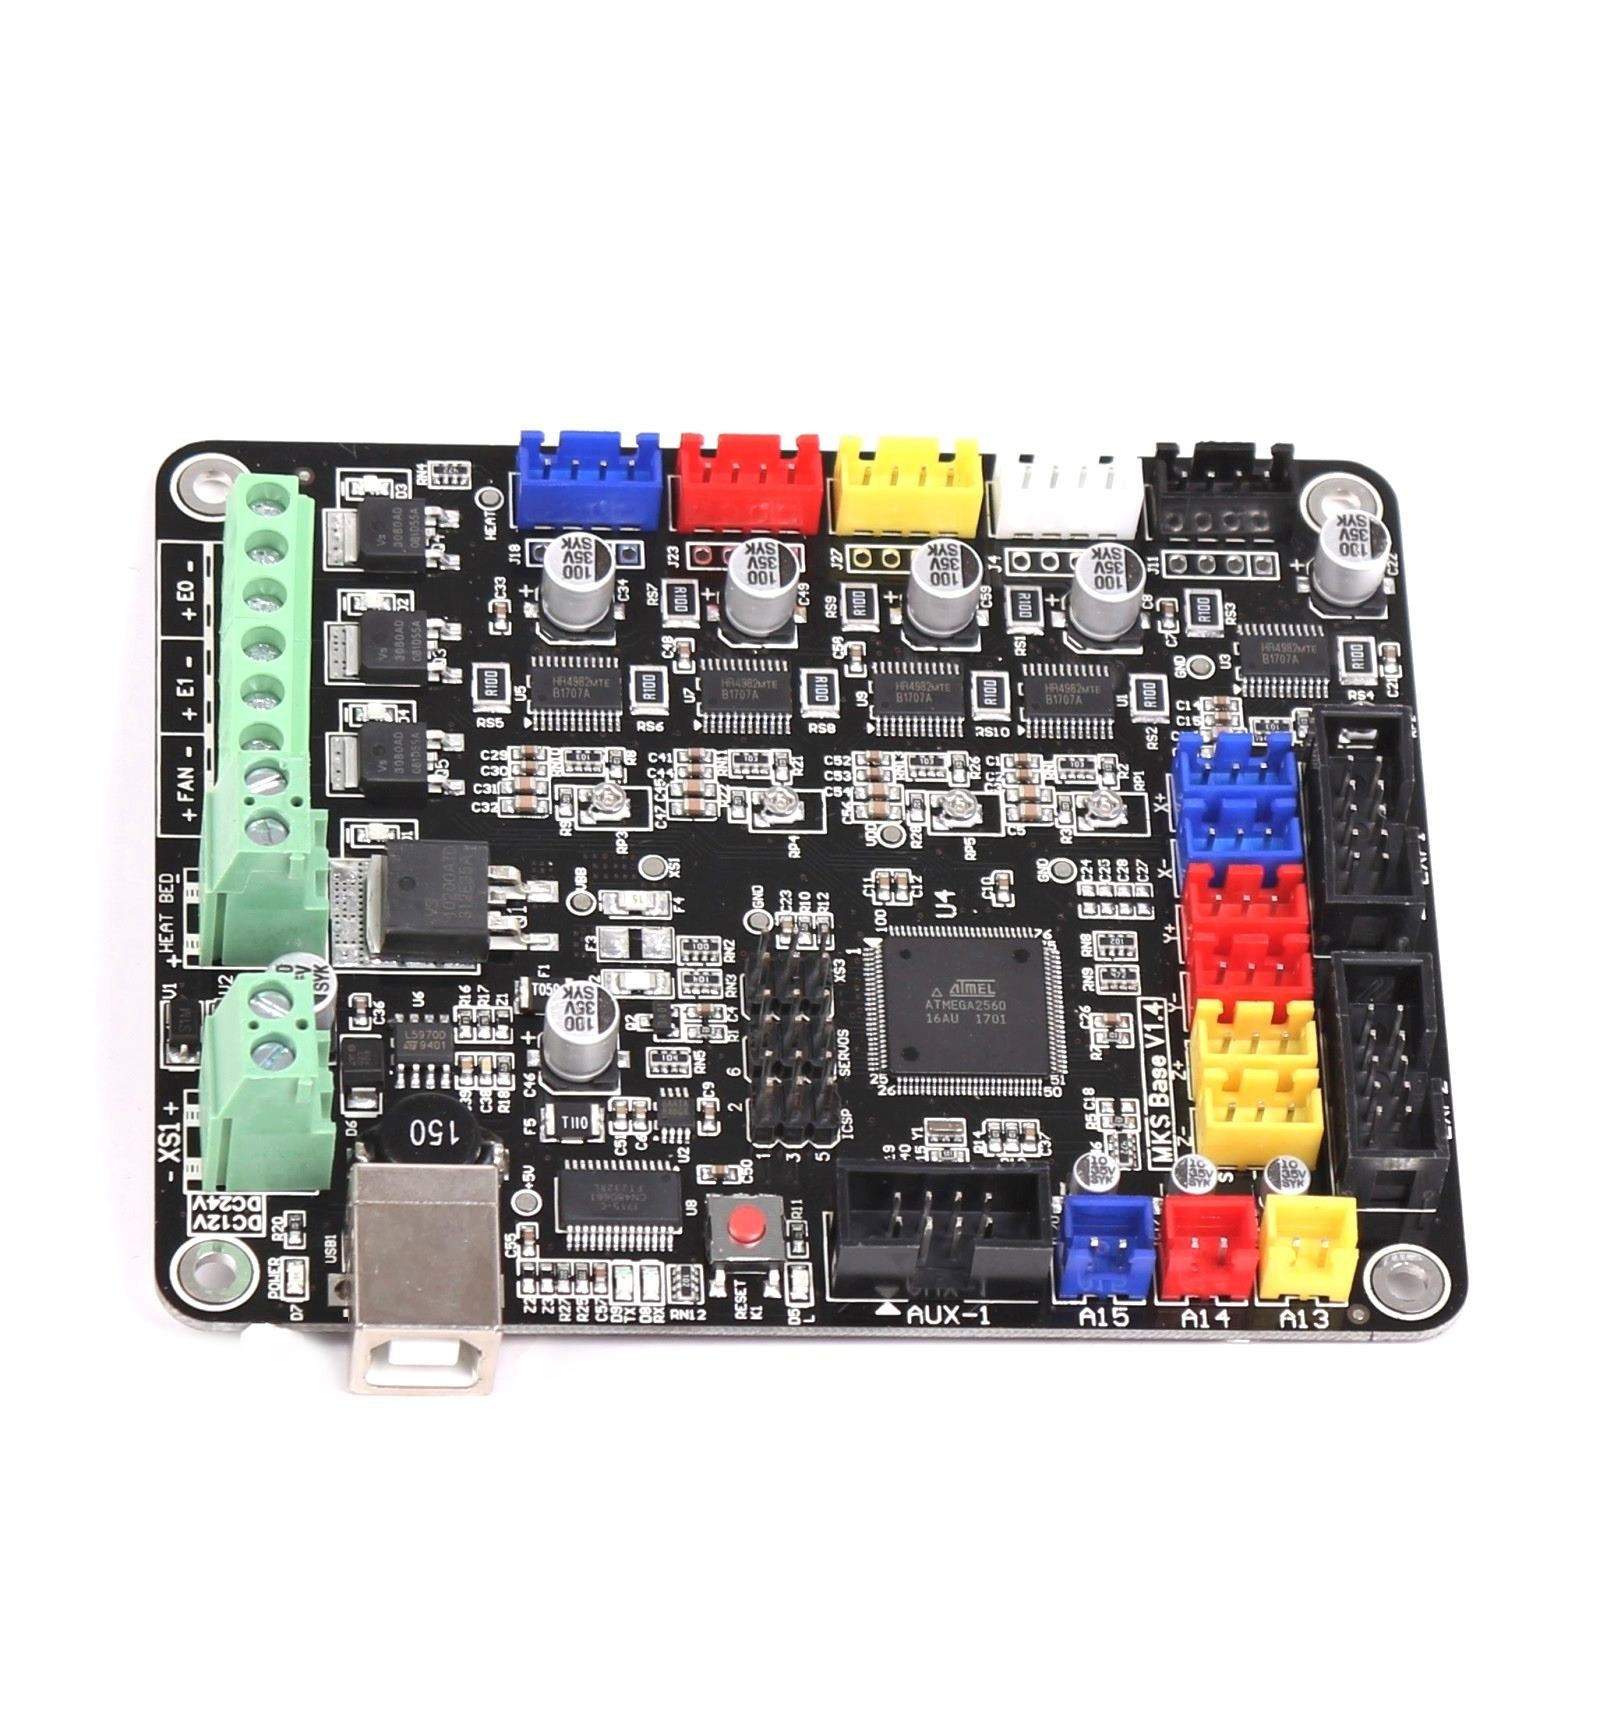 Tevo Tarantula Motherboard Mks Base V1.4 | 3D Printing - Tevo Tarantula Wiring Diagram